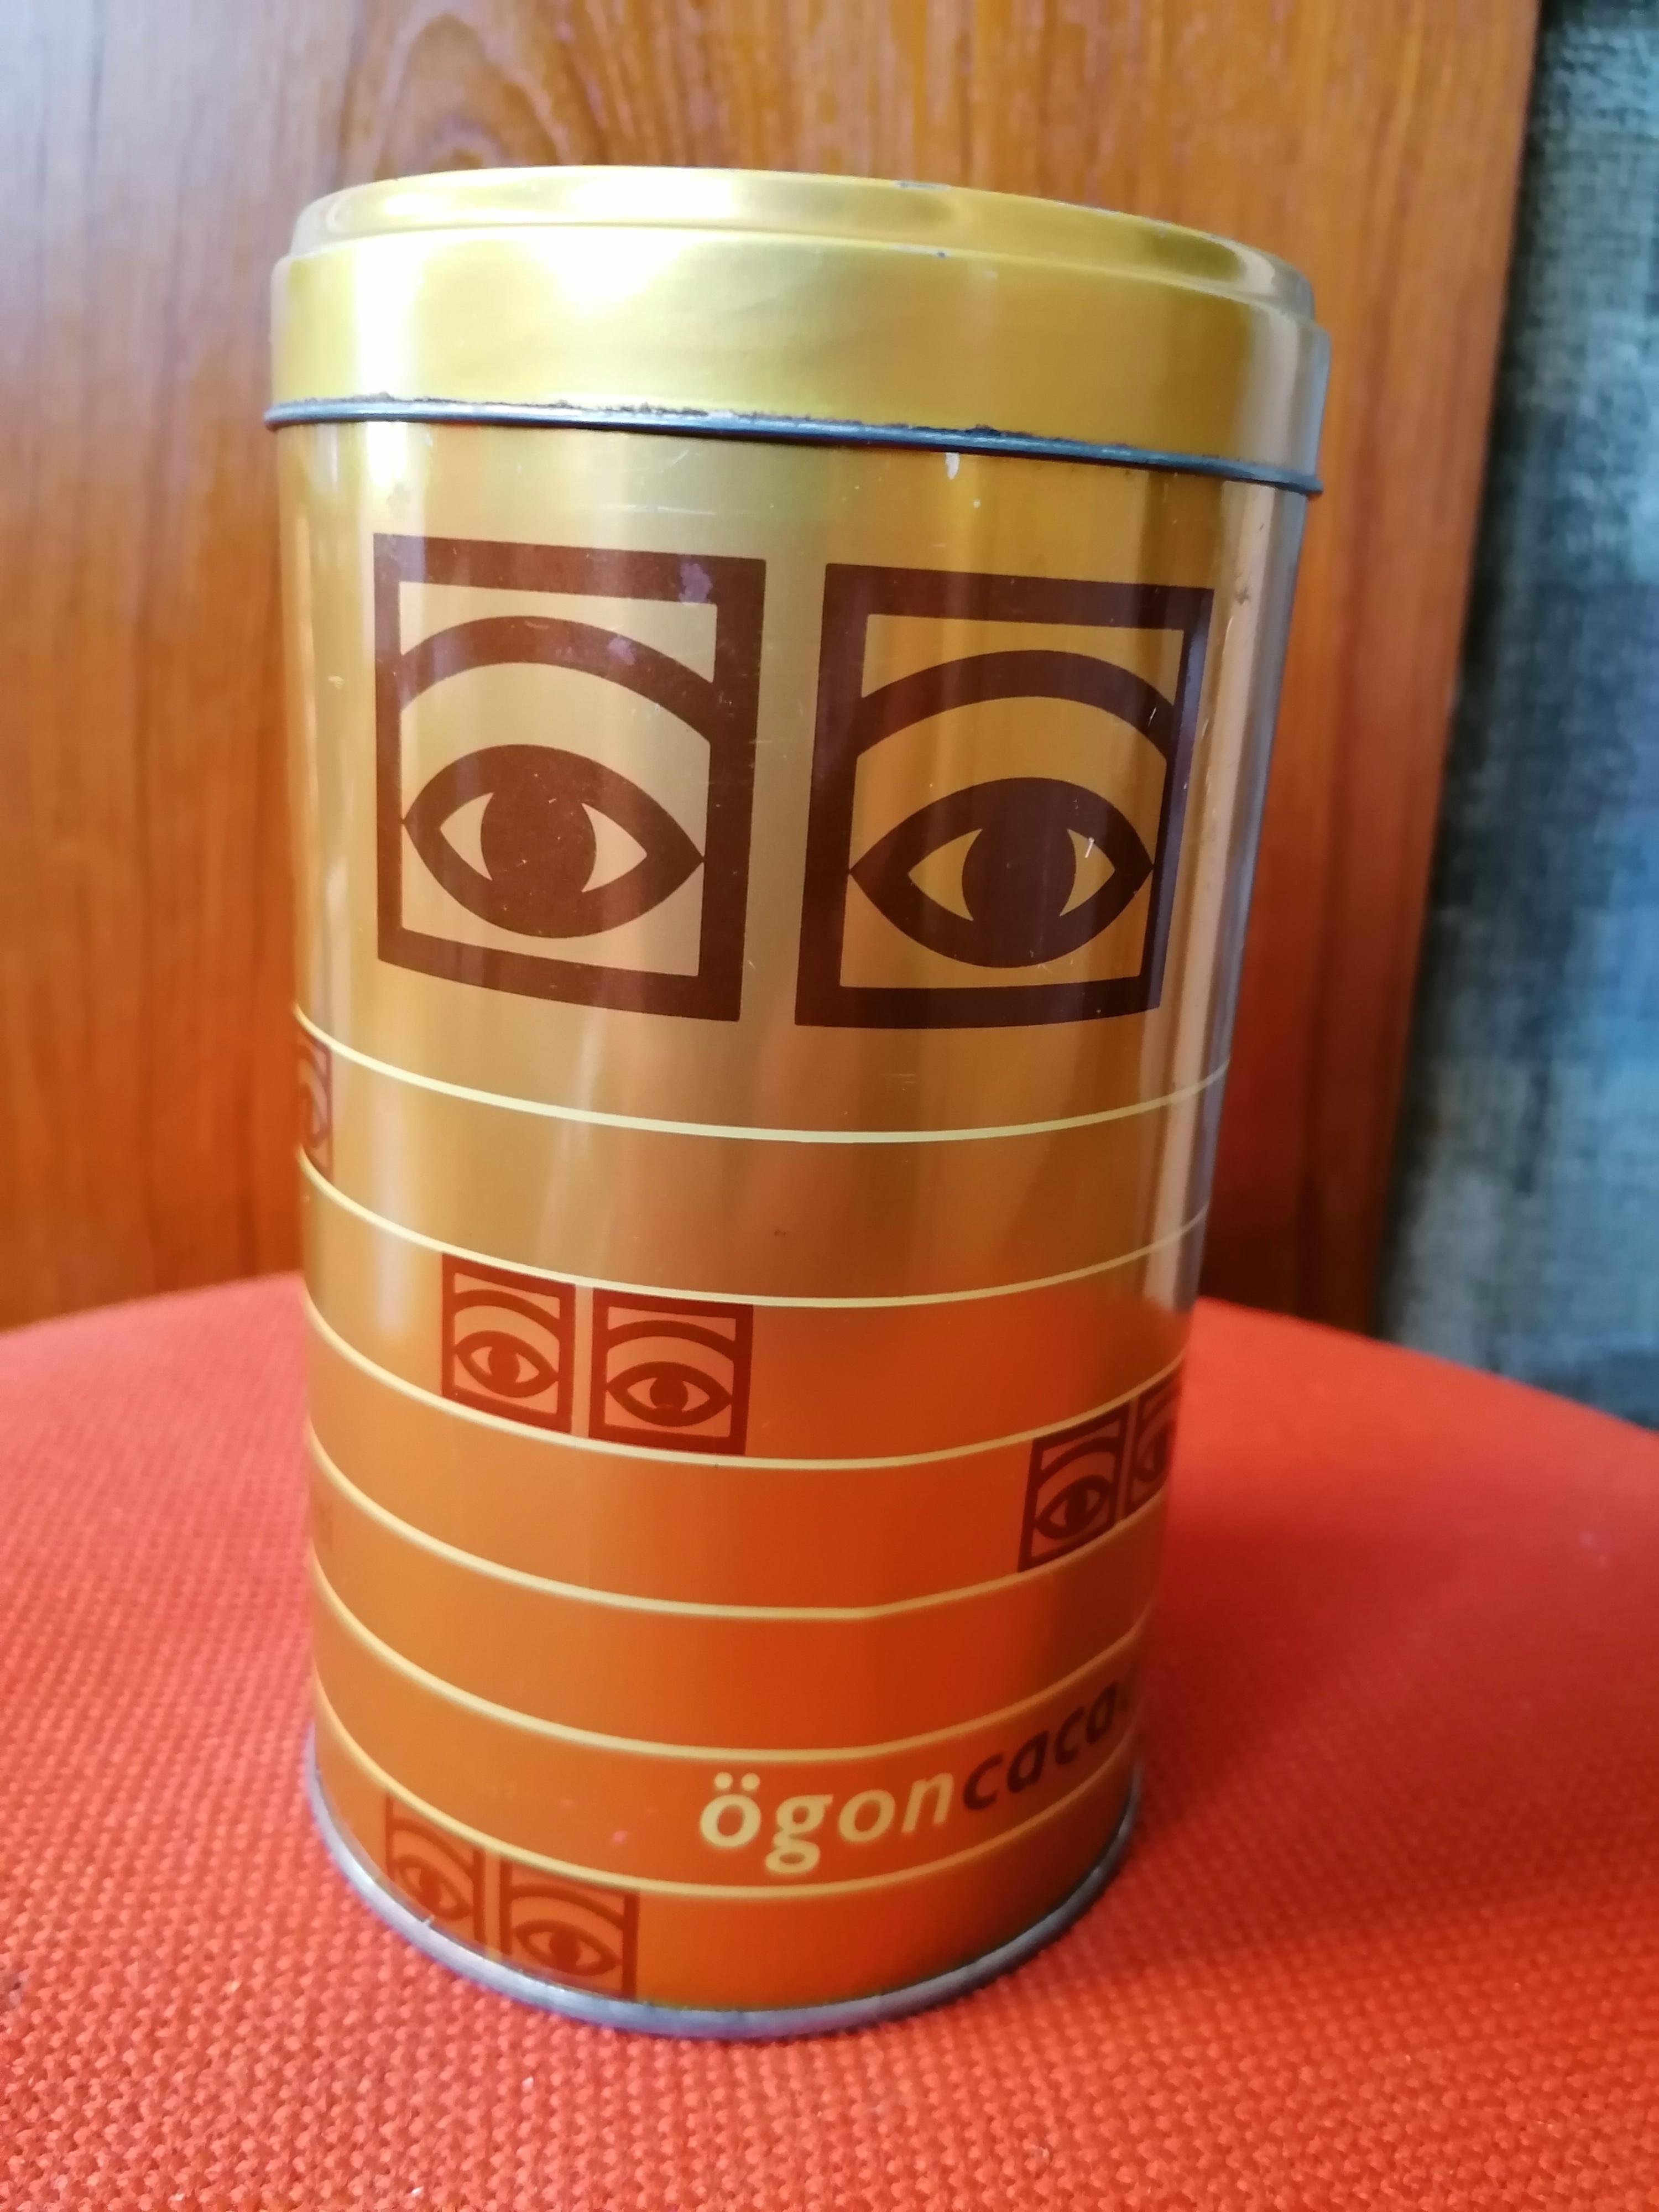 Plåtburk Ögonkakao 50-tal